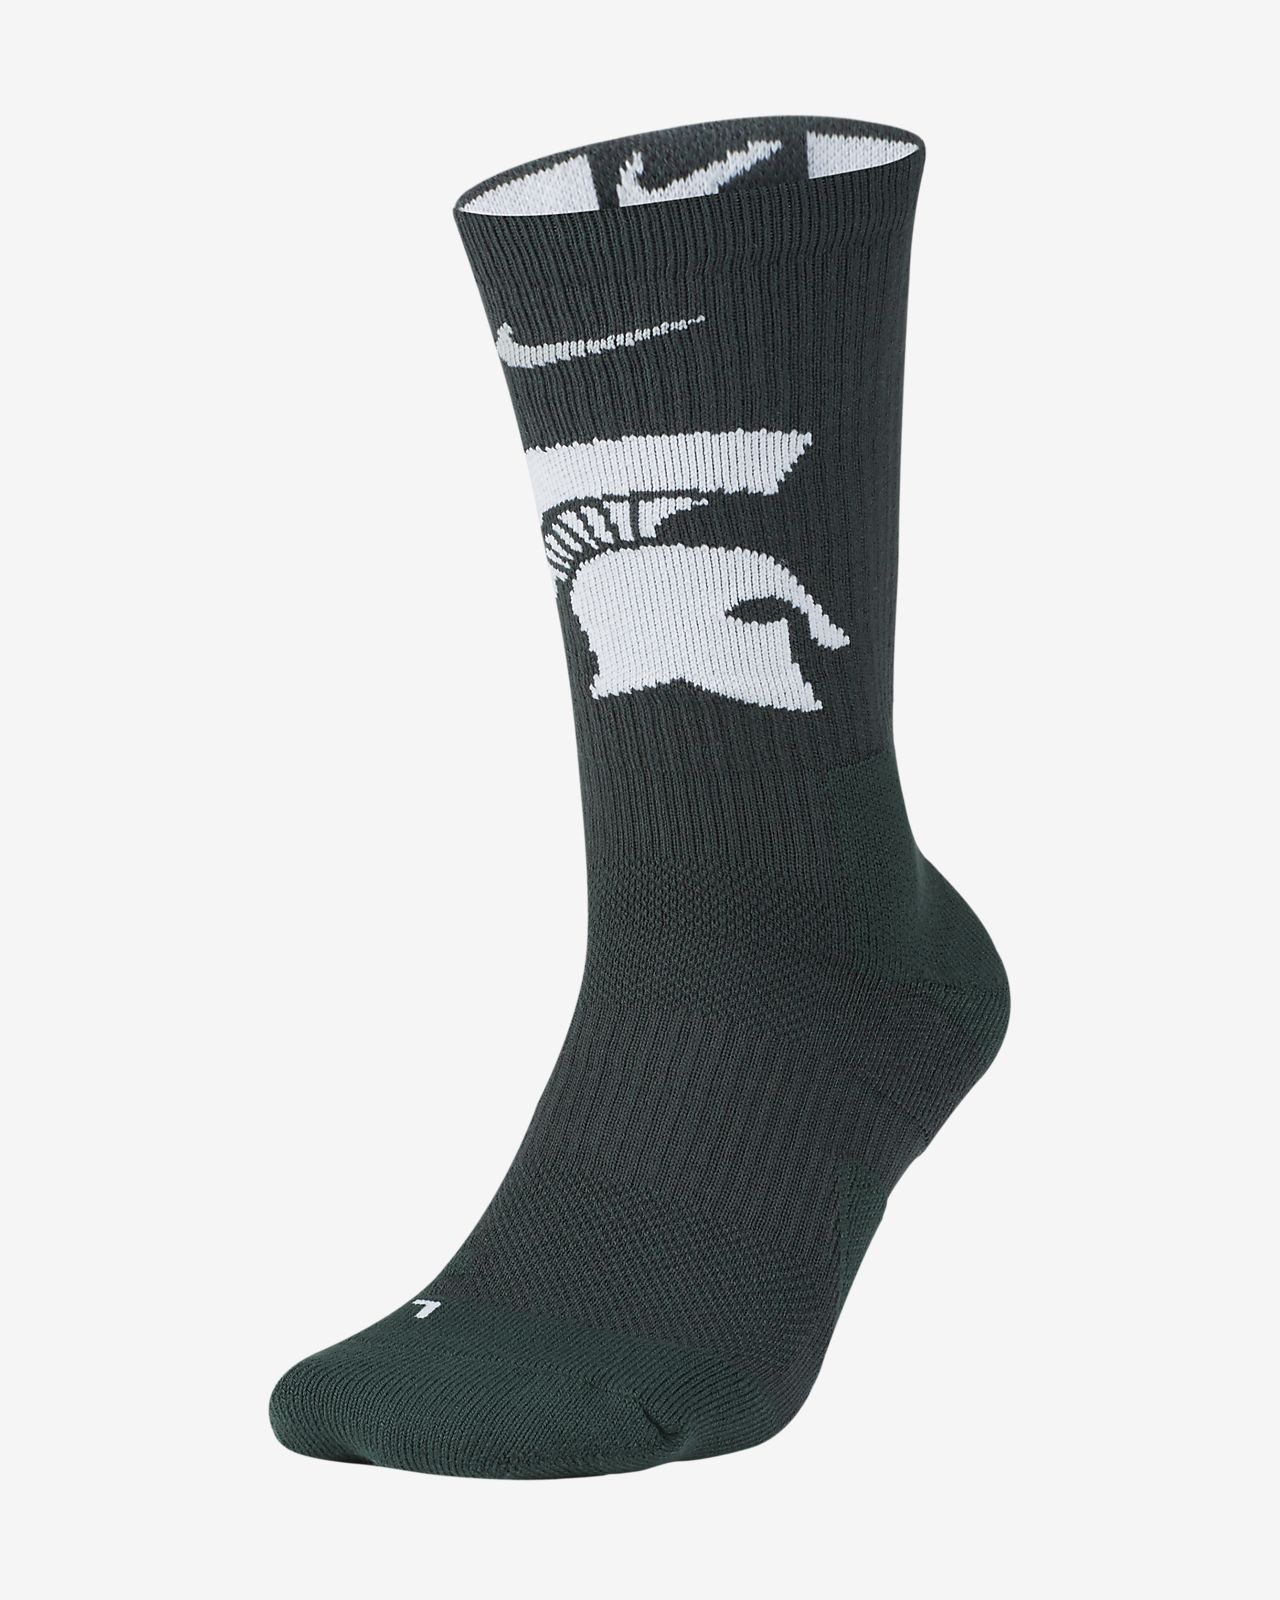 Nike College Elite (Michigan State) Basketball Crew Socks